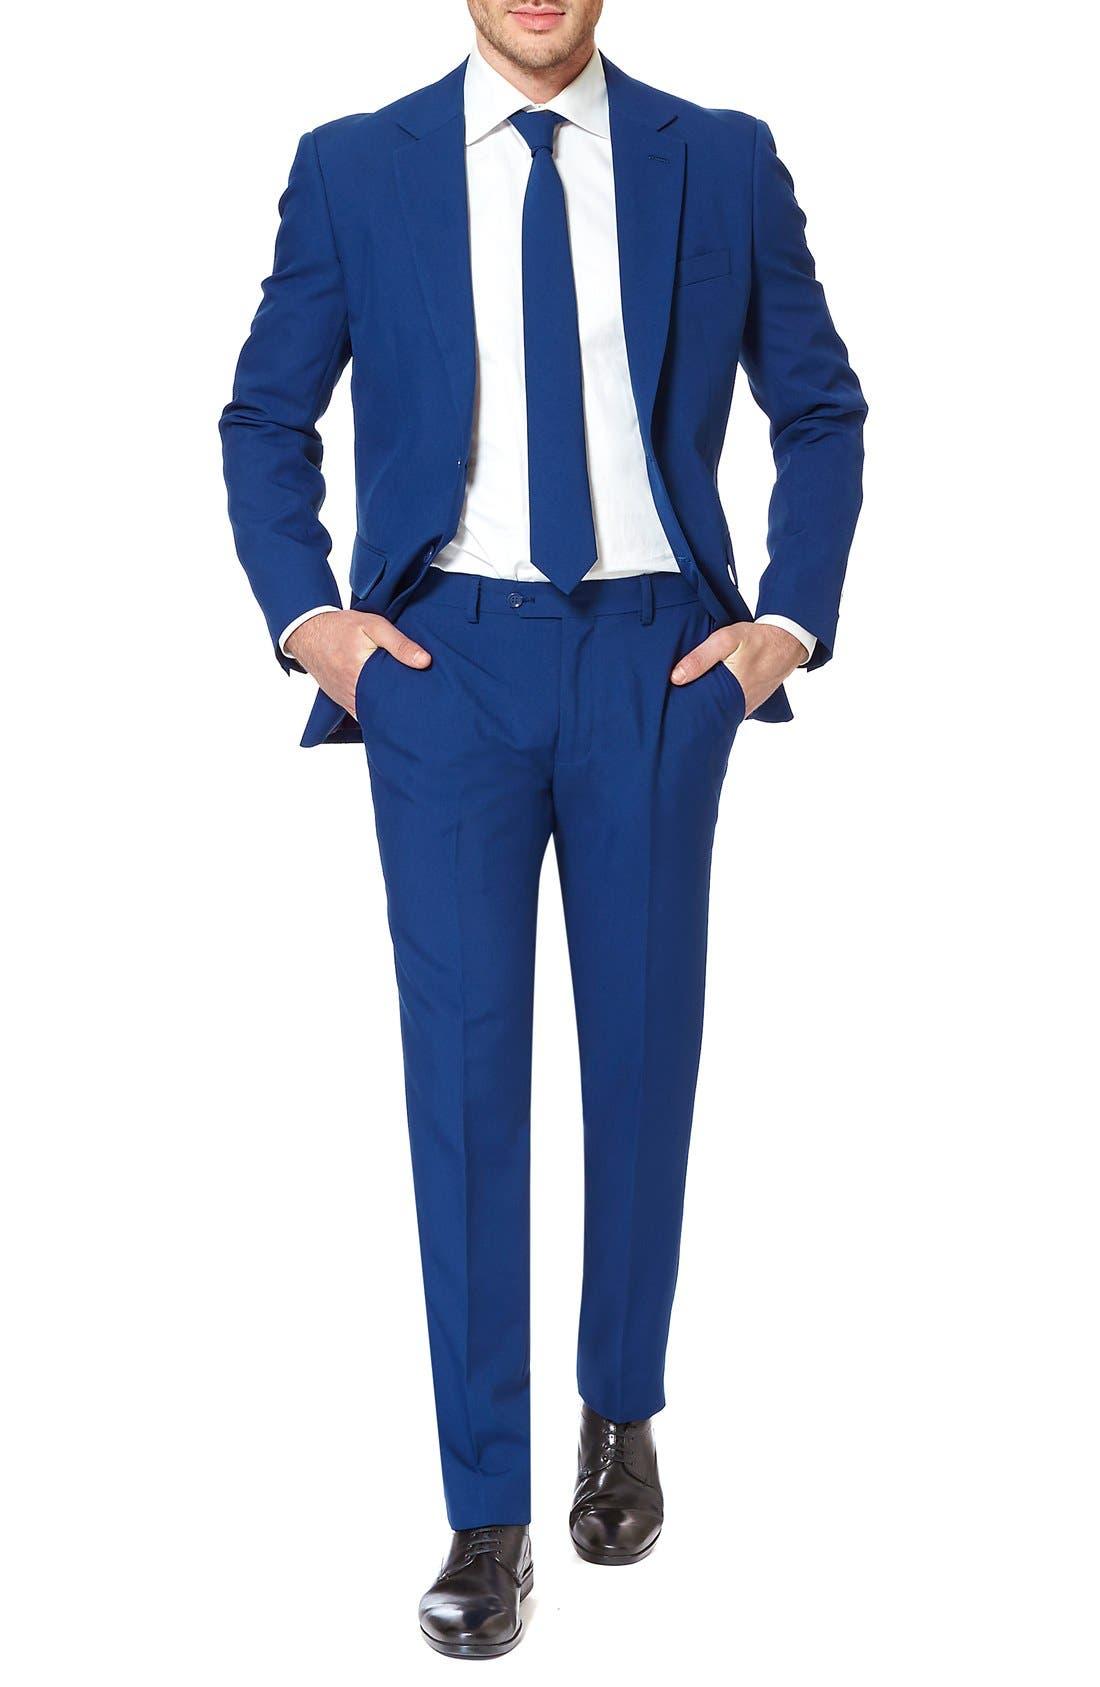 'Navy Royale' Trim Fit Two-Piece Suit with Tie,                         Main,                         color, 410